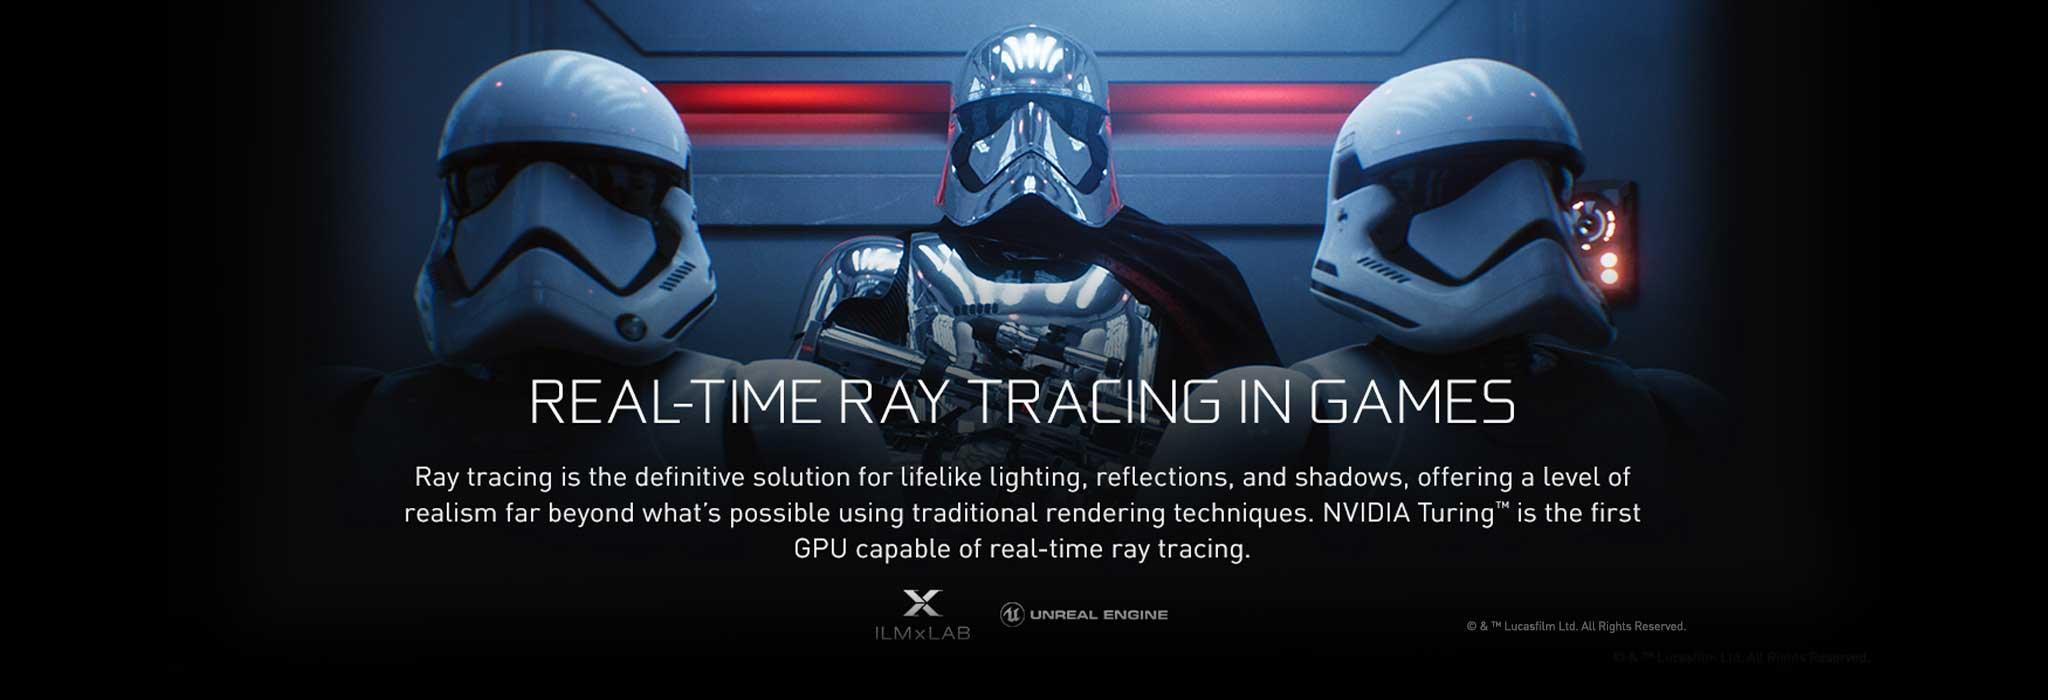 AORUS GeForce RTX™ 2080 Ti 11G | Graphics Card - GIGABYTE Global